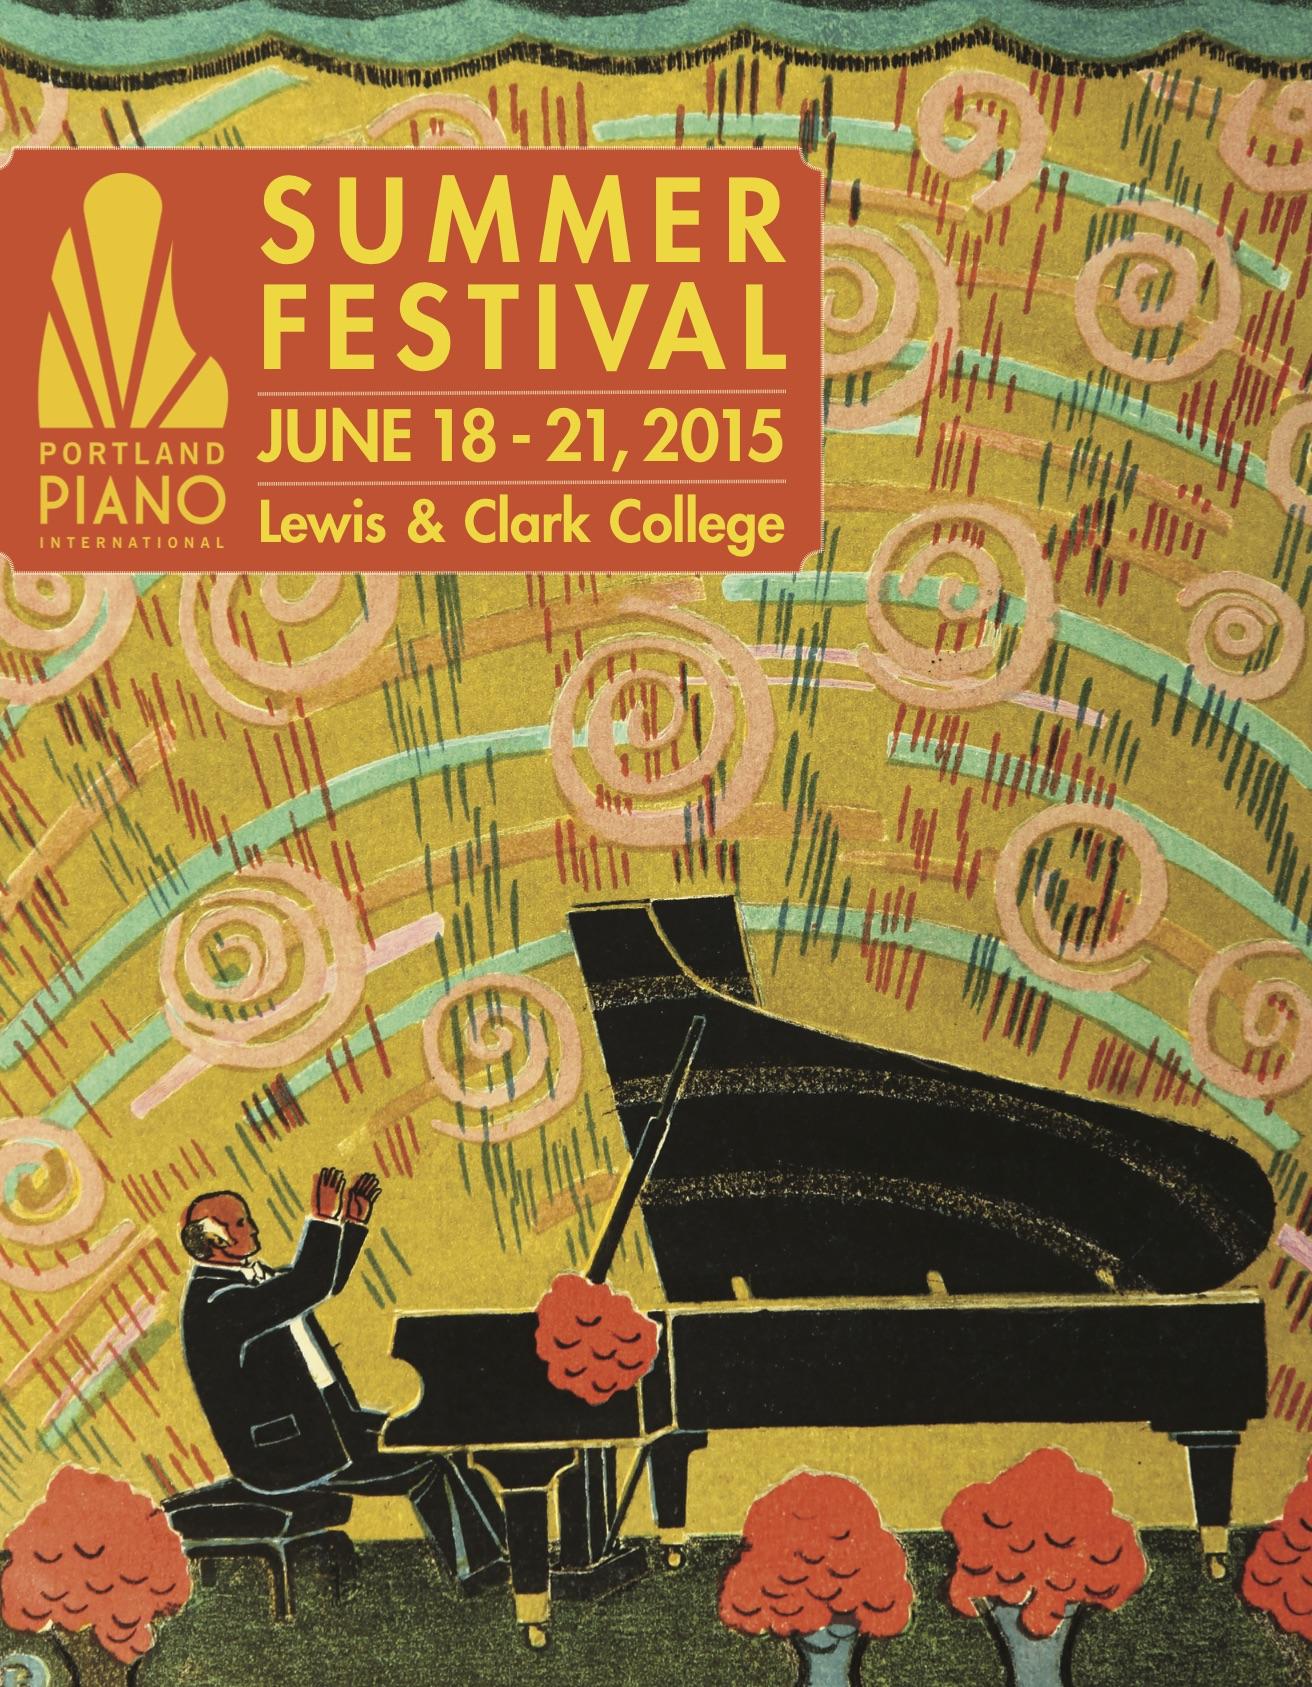 SummerFestival2015_1.jpg